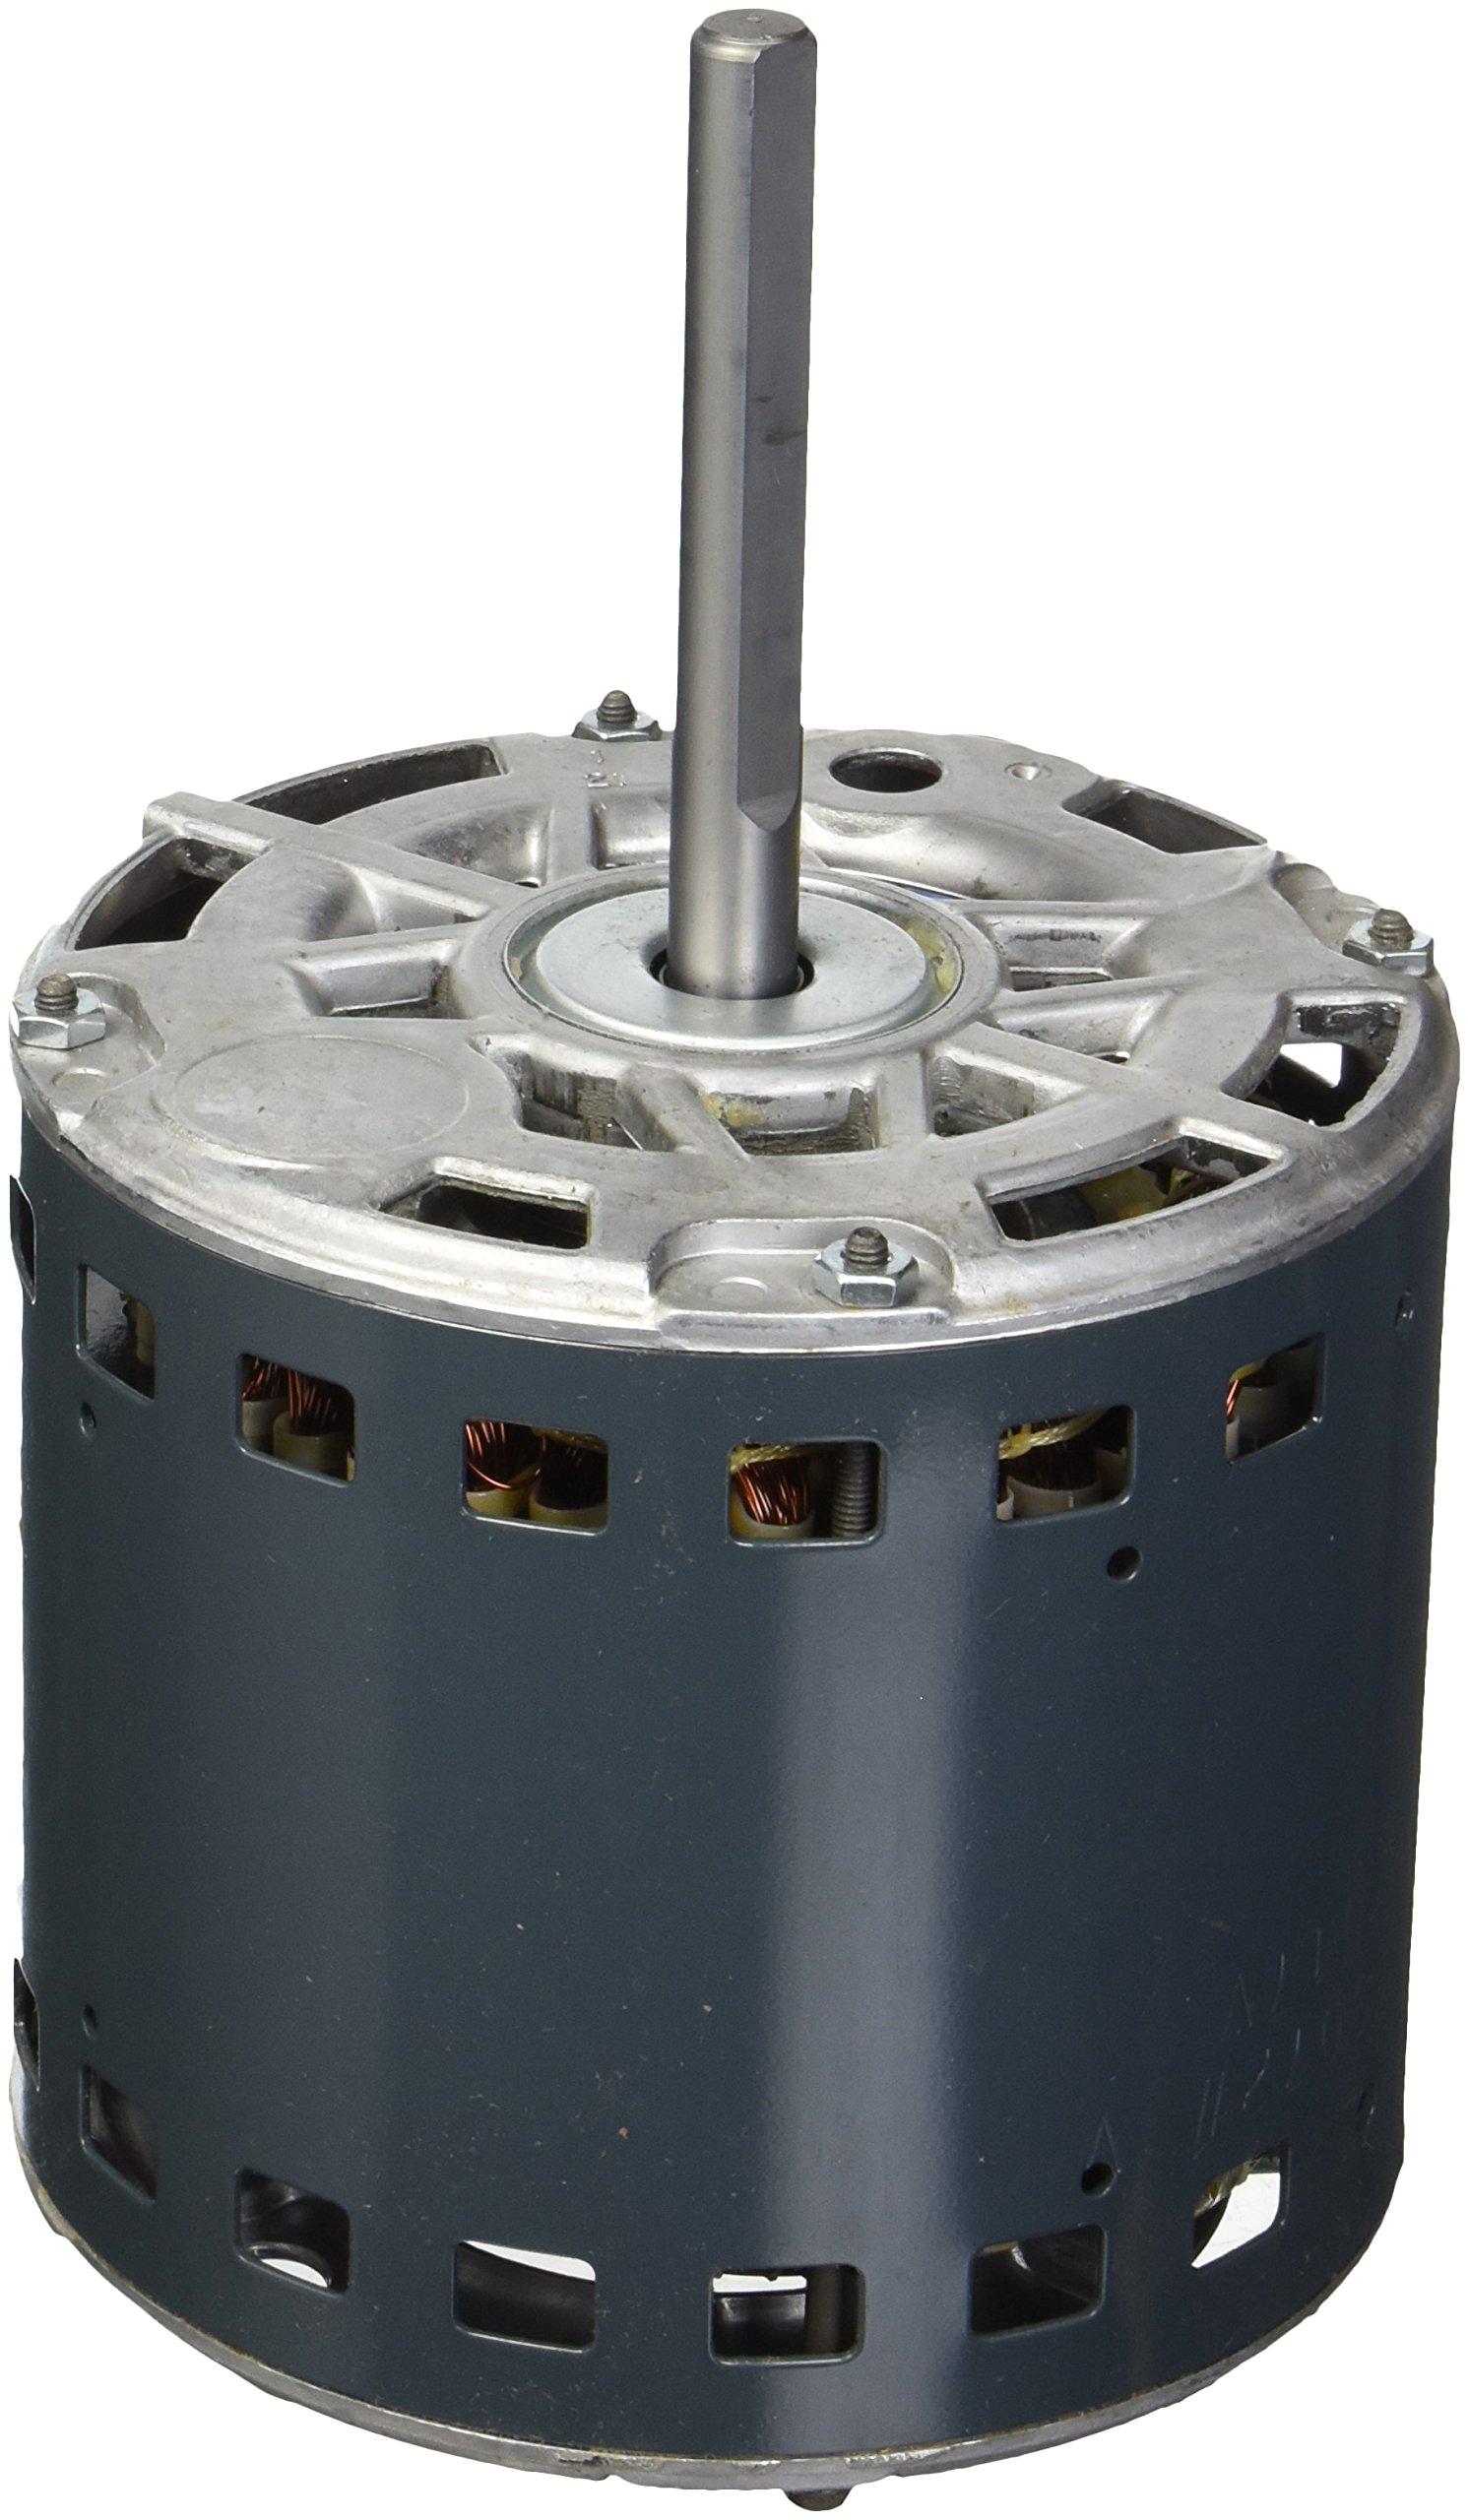 Protech 51-24272-01 1/2 hp 120/1/60 Blower Motor